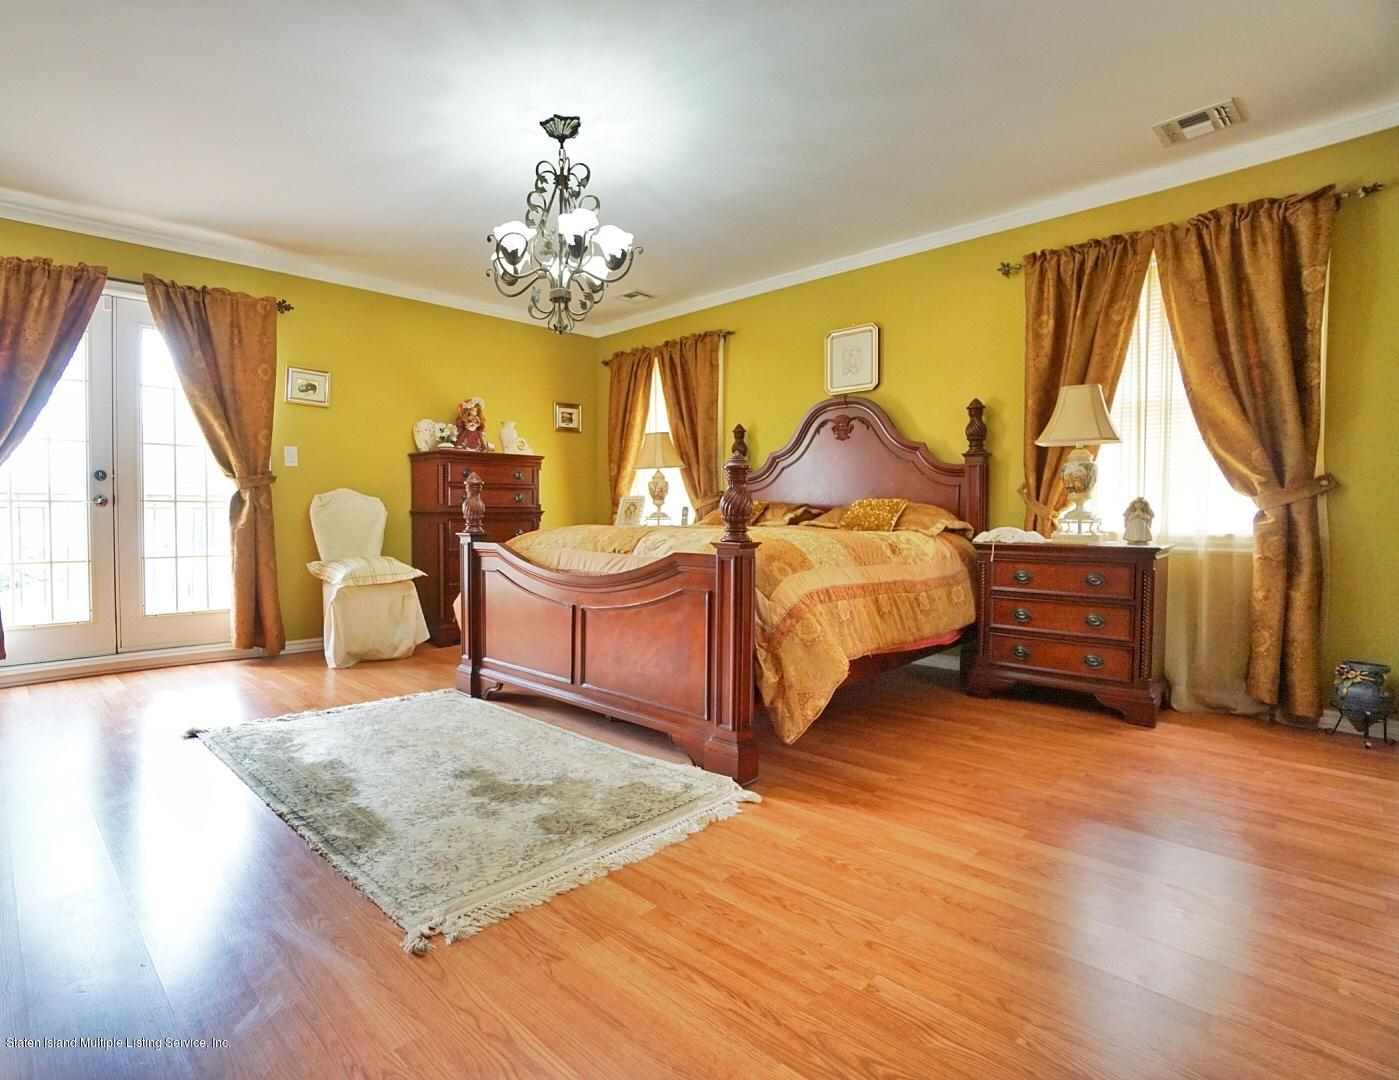 Single Family - Detached 67 Marvin Road  Staten Island, NY 10309, MLS-1128691-21